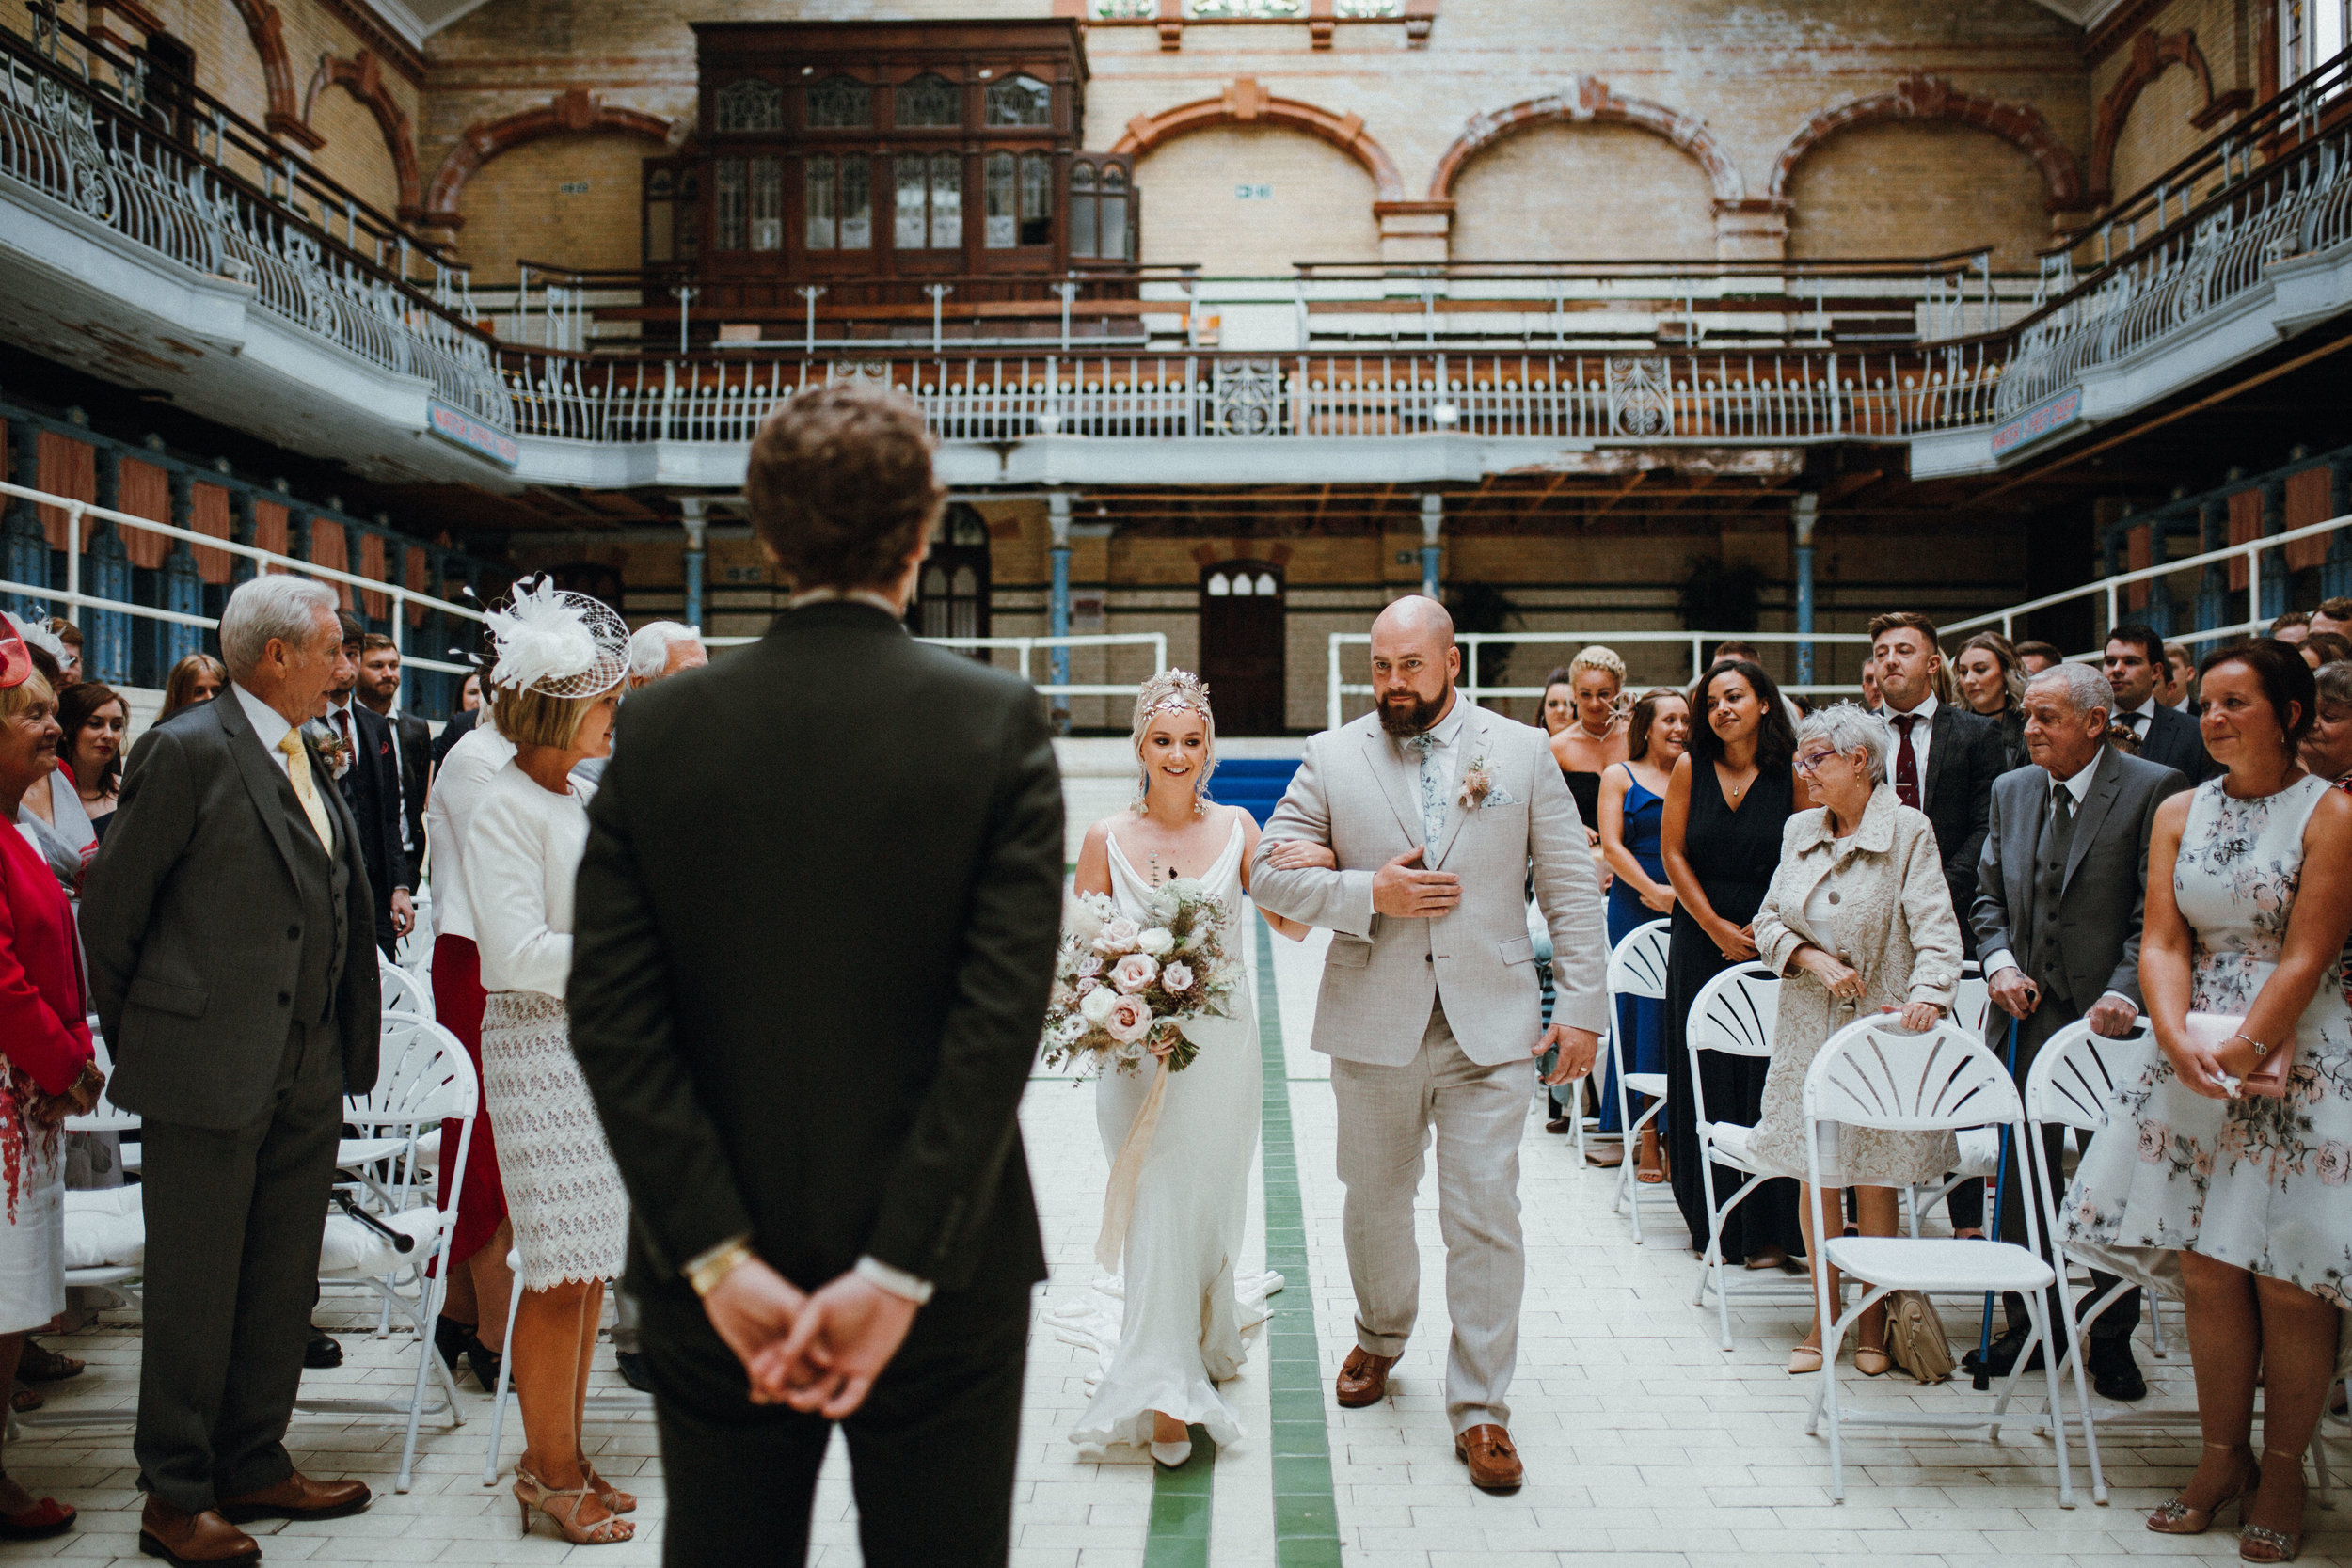 Bride walking up the aisle at Victoria Baths